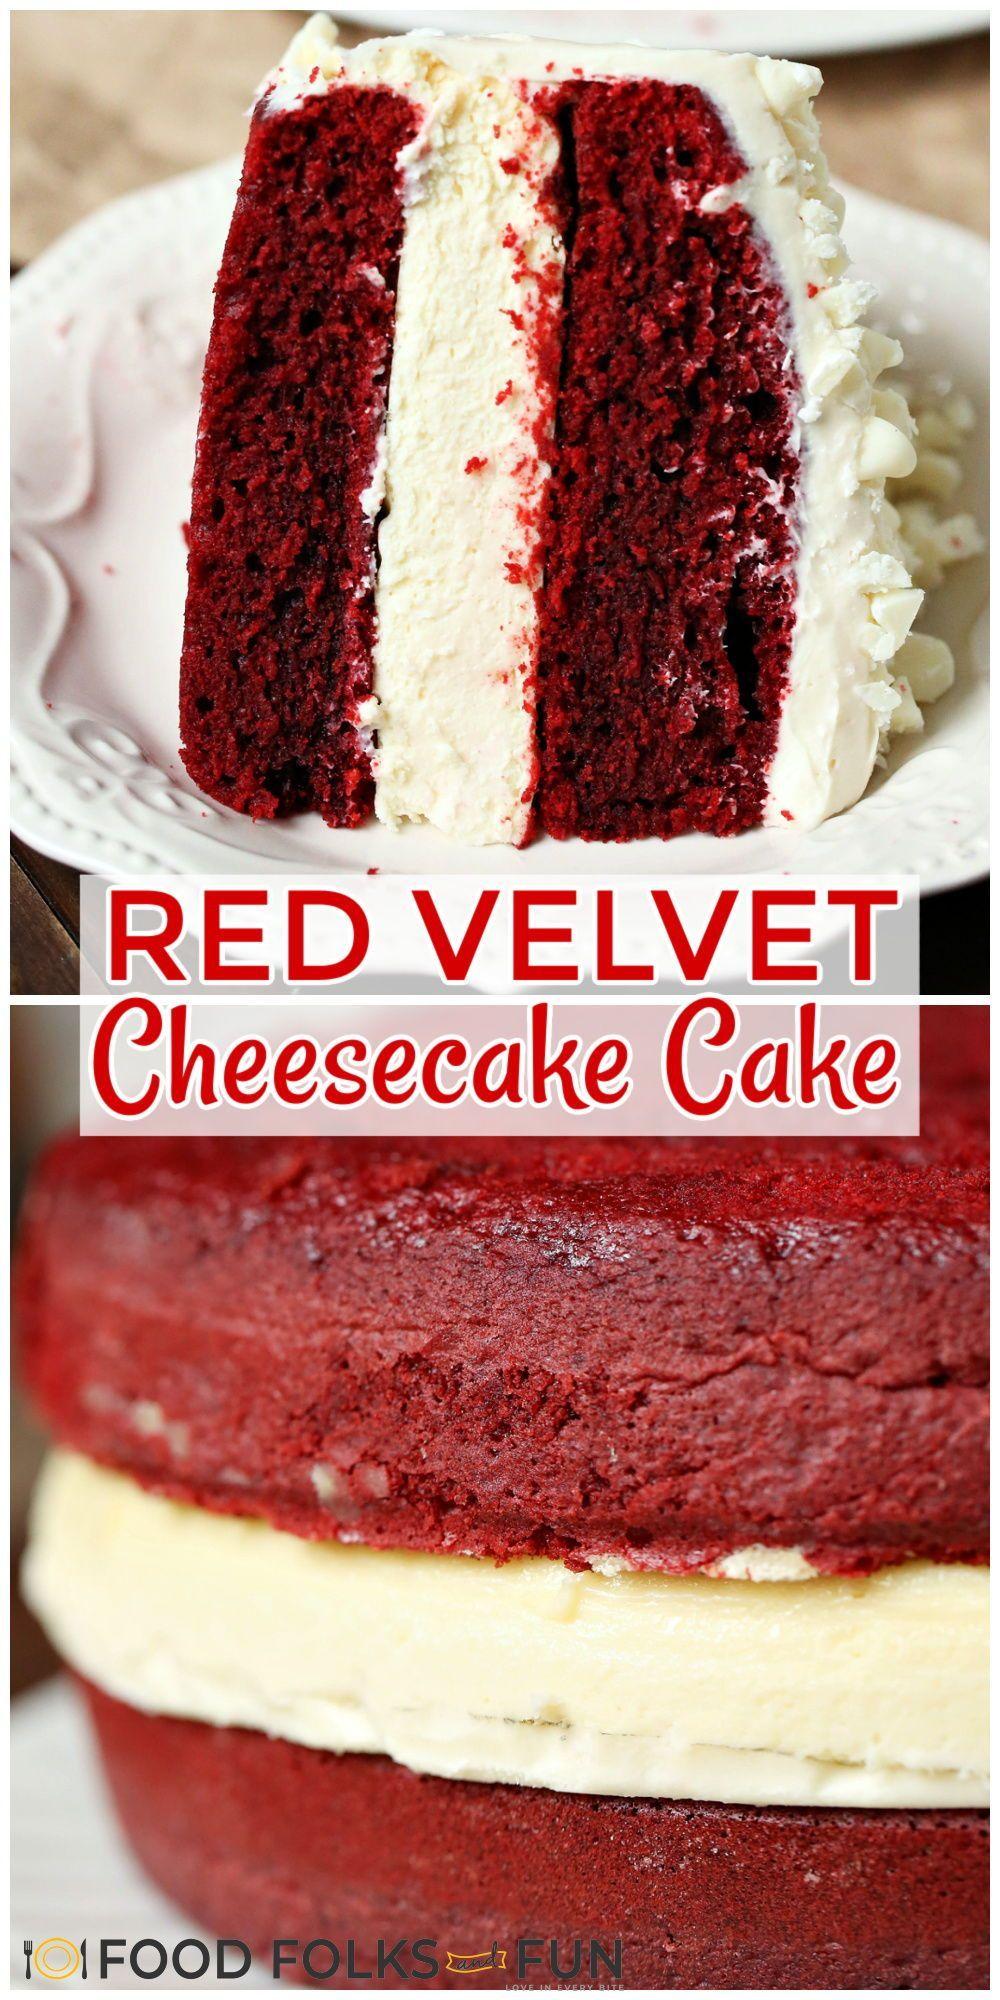 Copycat Cheesecake Factory Red Velvet Cheesecake Cake Recipe Cake Recipes Dessert Recipes Dessert Recipes Easy